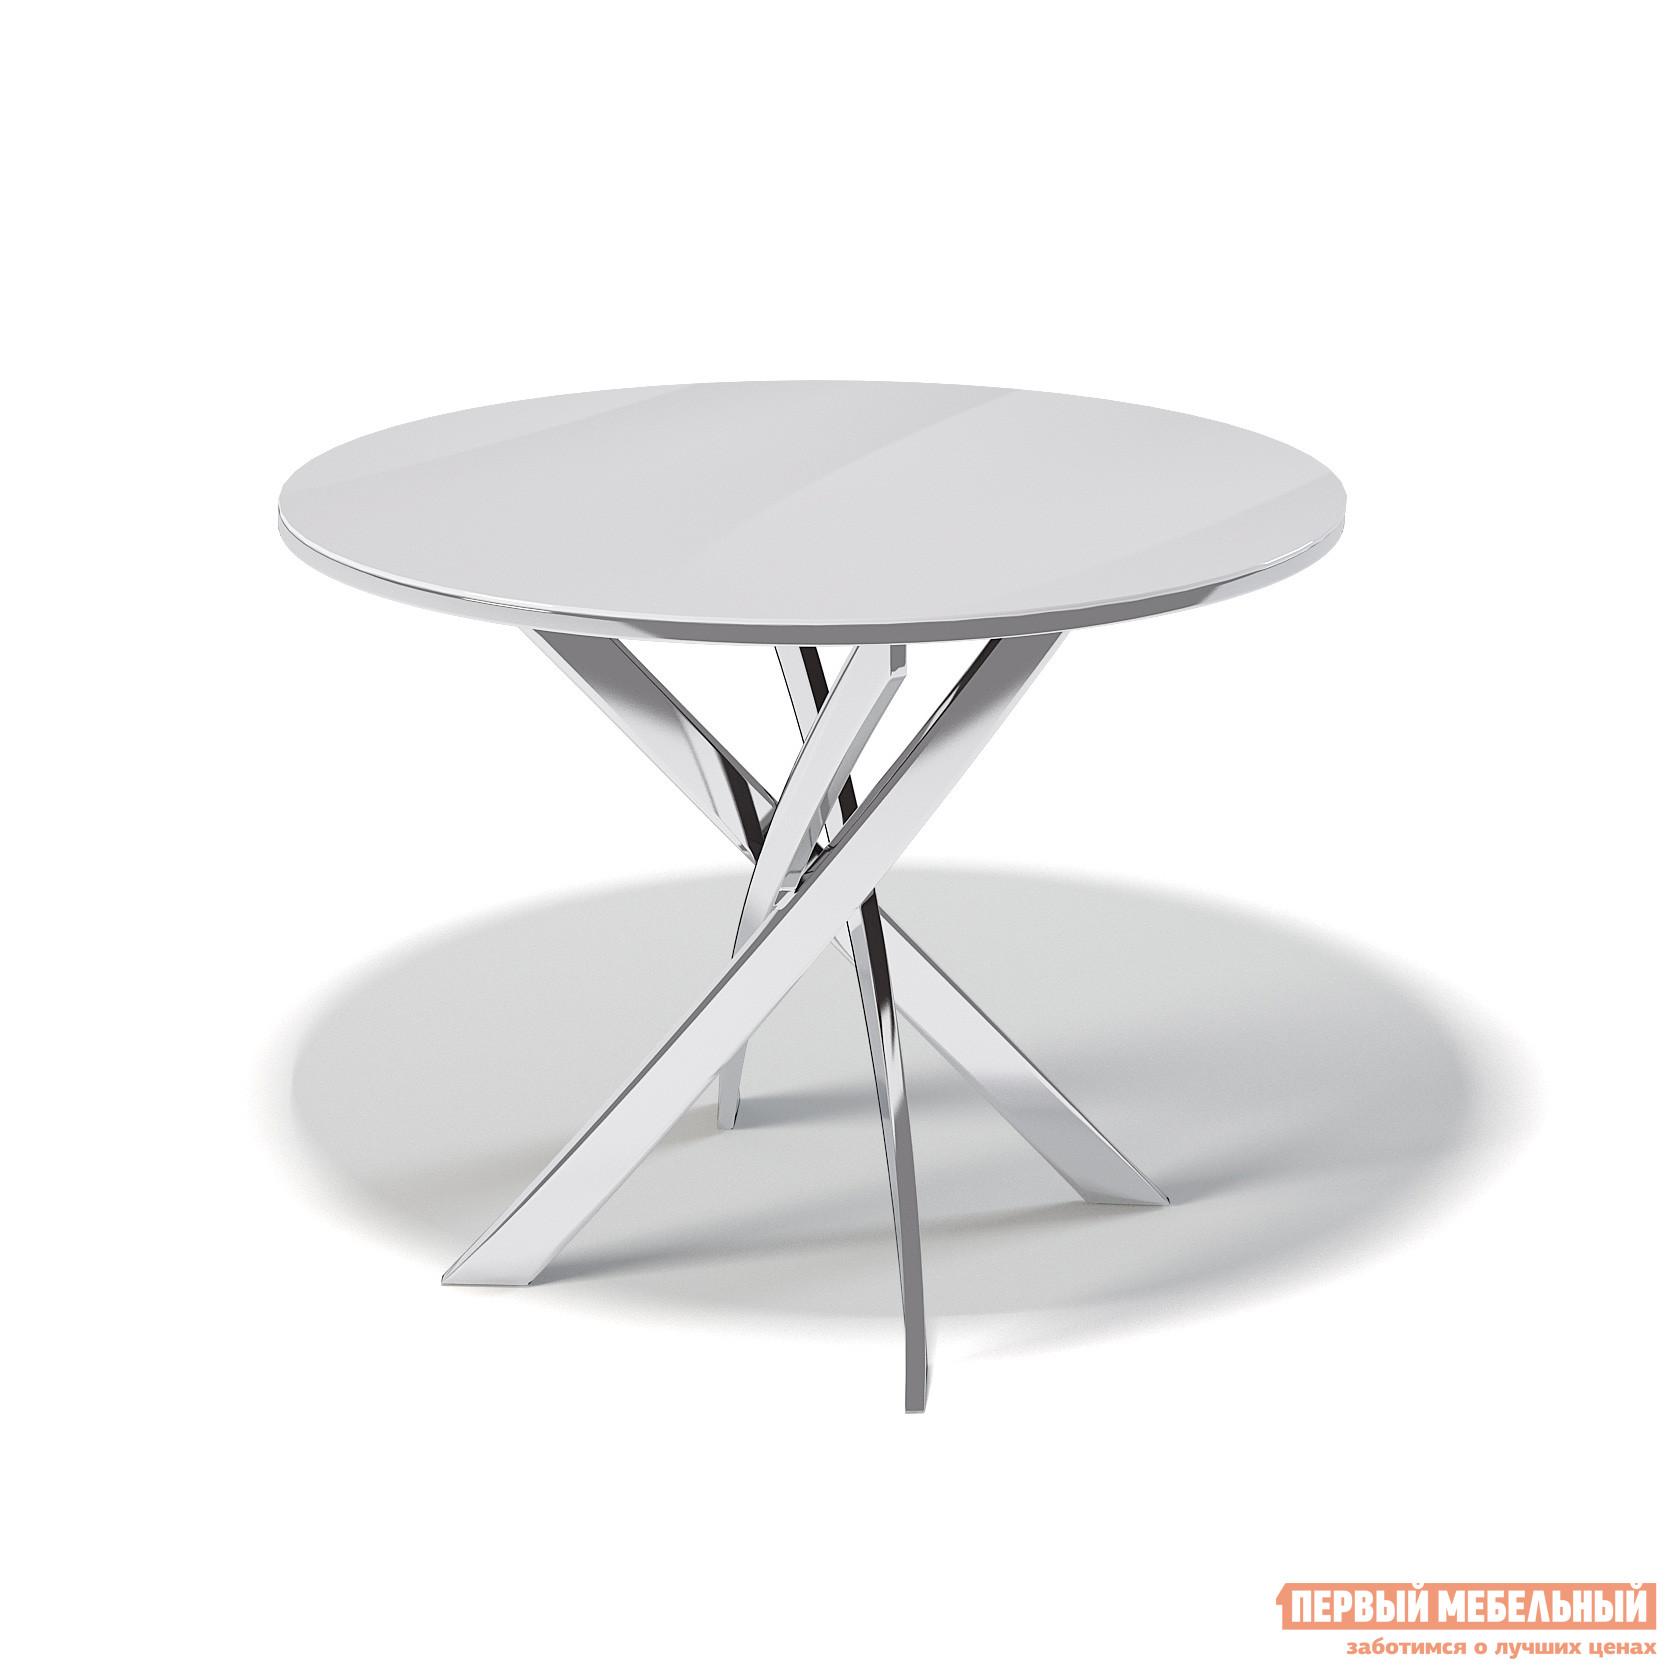 Круглый кухонный стол стеклянный ДИК KENNER R1000 cz h37s